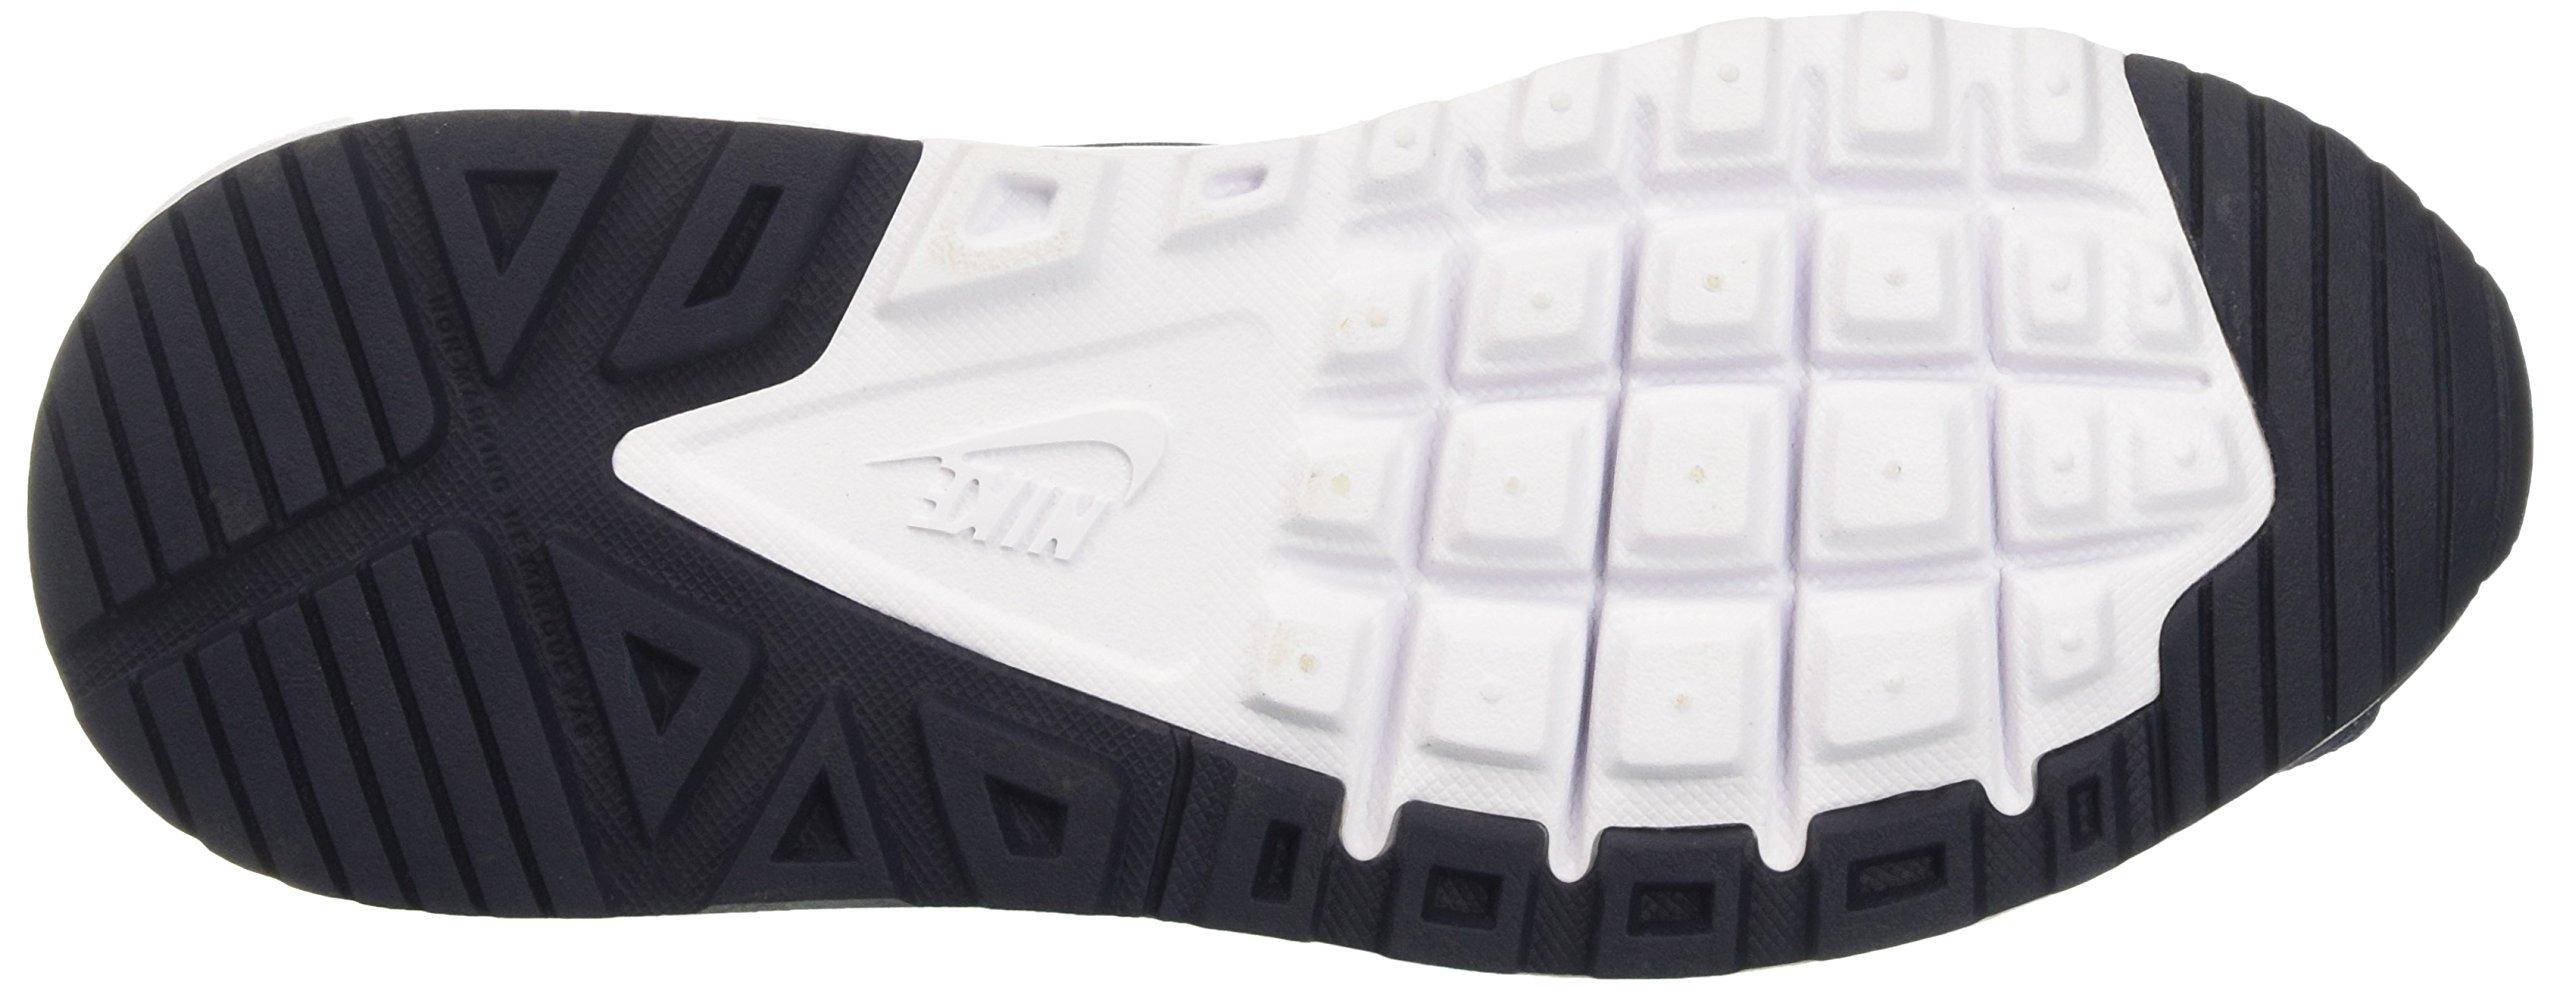 Nike Air Max Command Flex (GS) Scarpe da Ginnastica Basse Unisex – Bambini a8c15062167